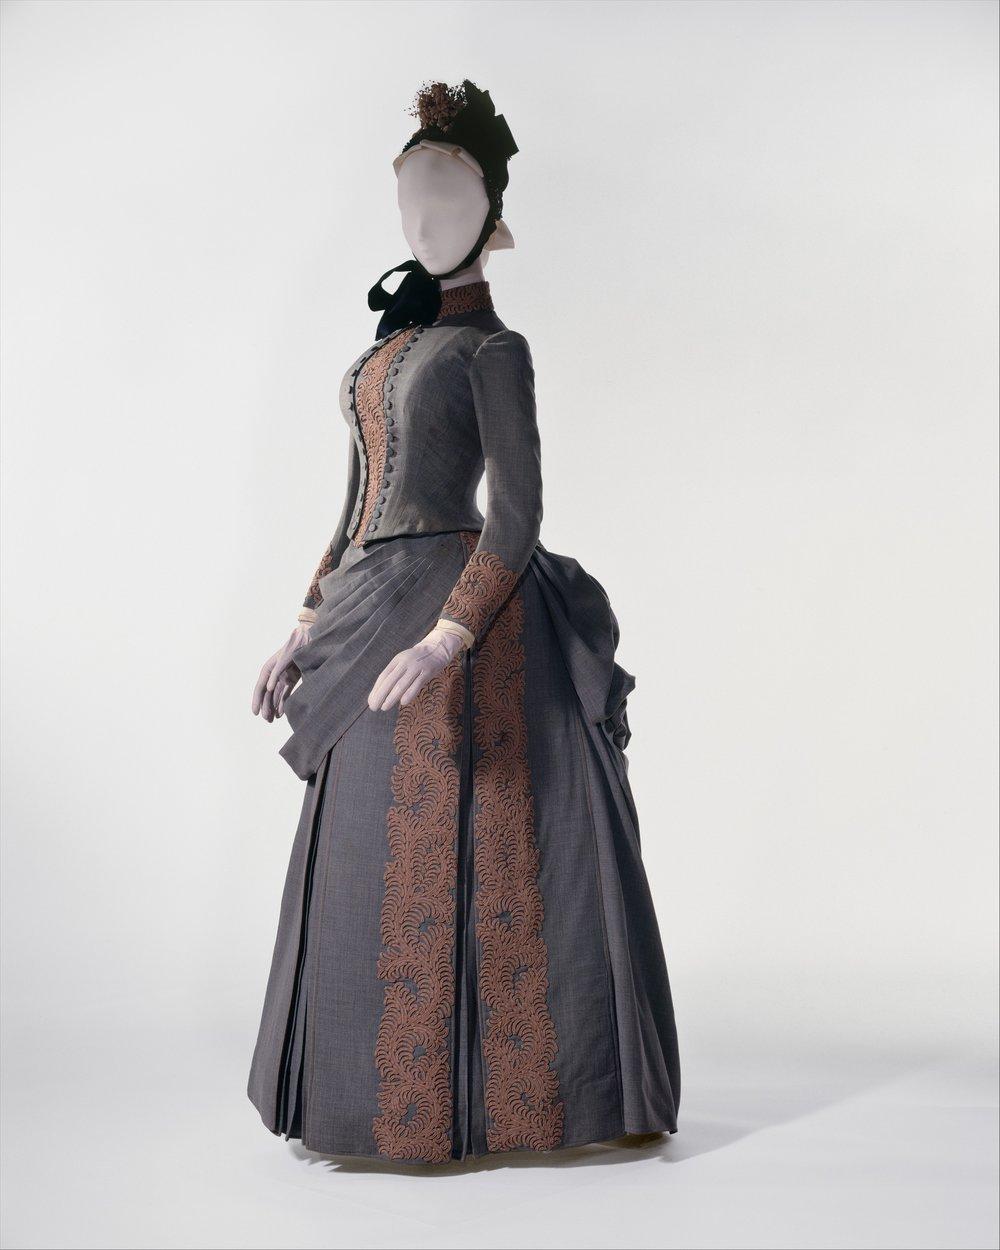 """Masterpieces of The Metropolitan Museum of Art"". Herman Rossberg, Abbigliamento per matrimonio, 1887"